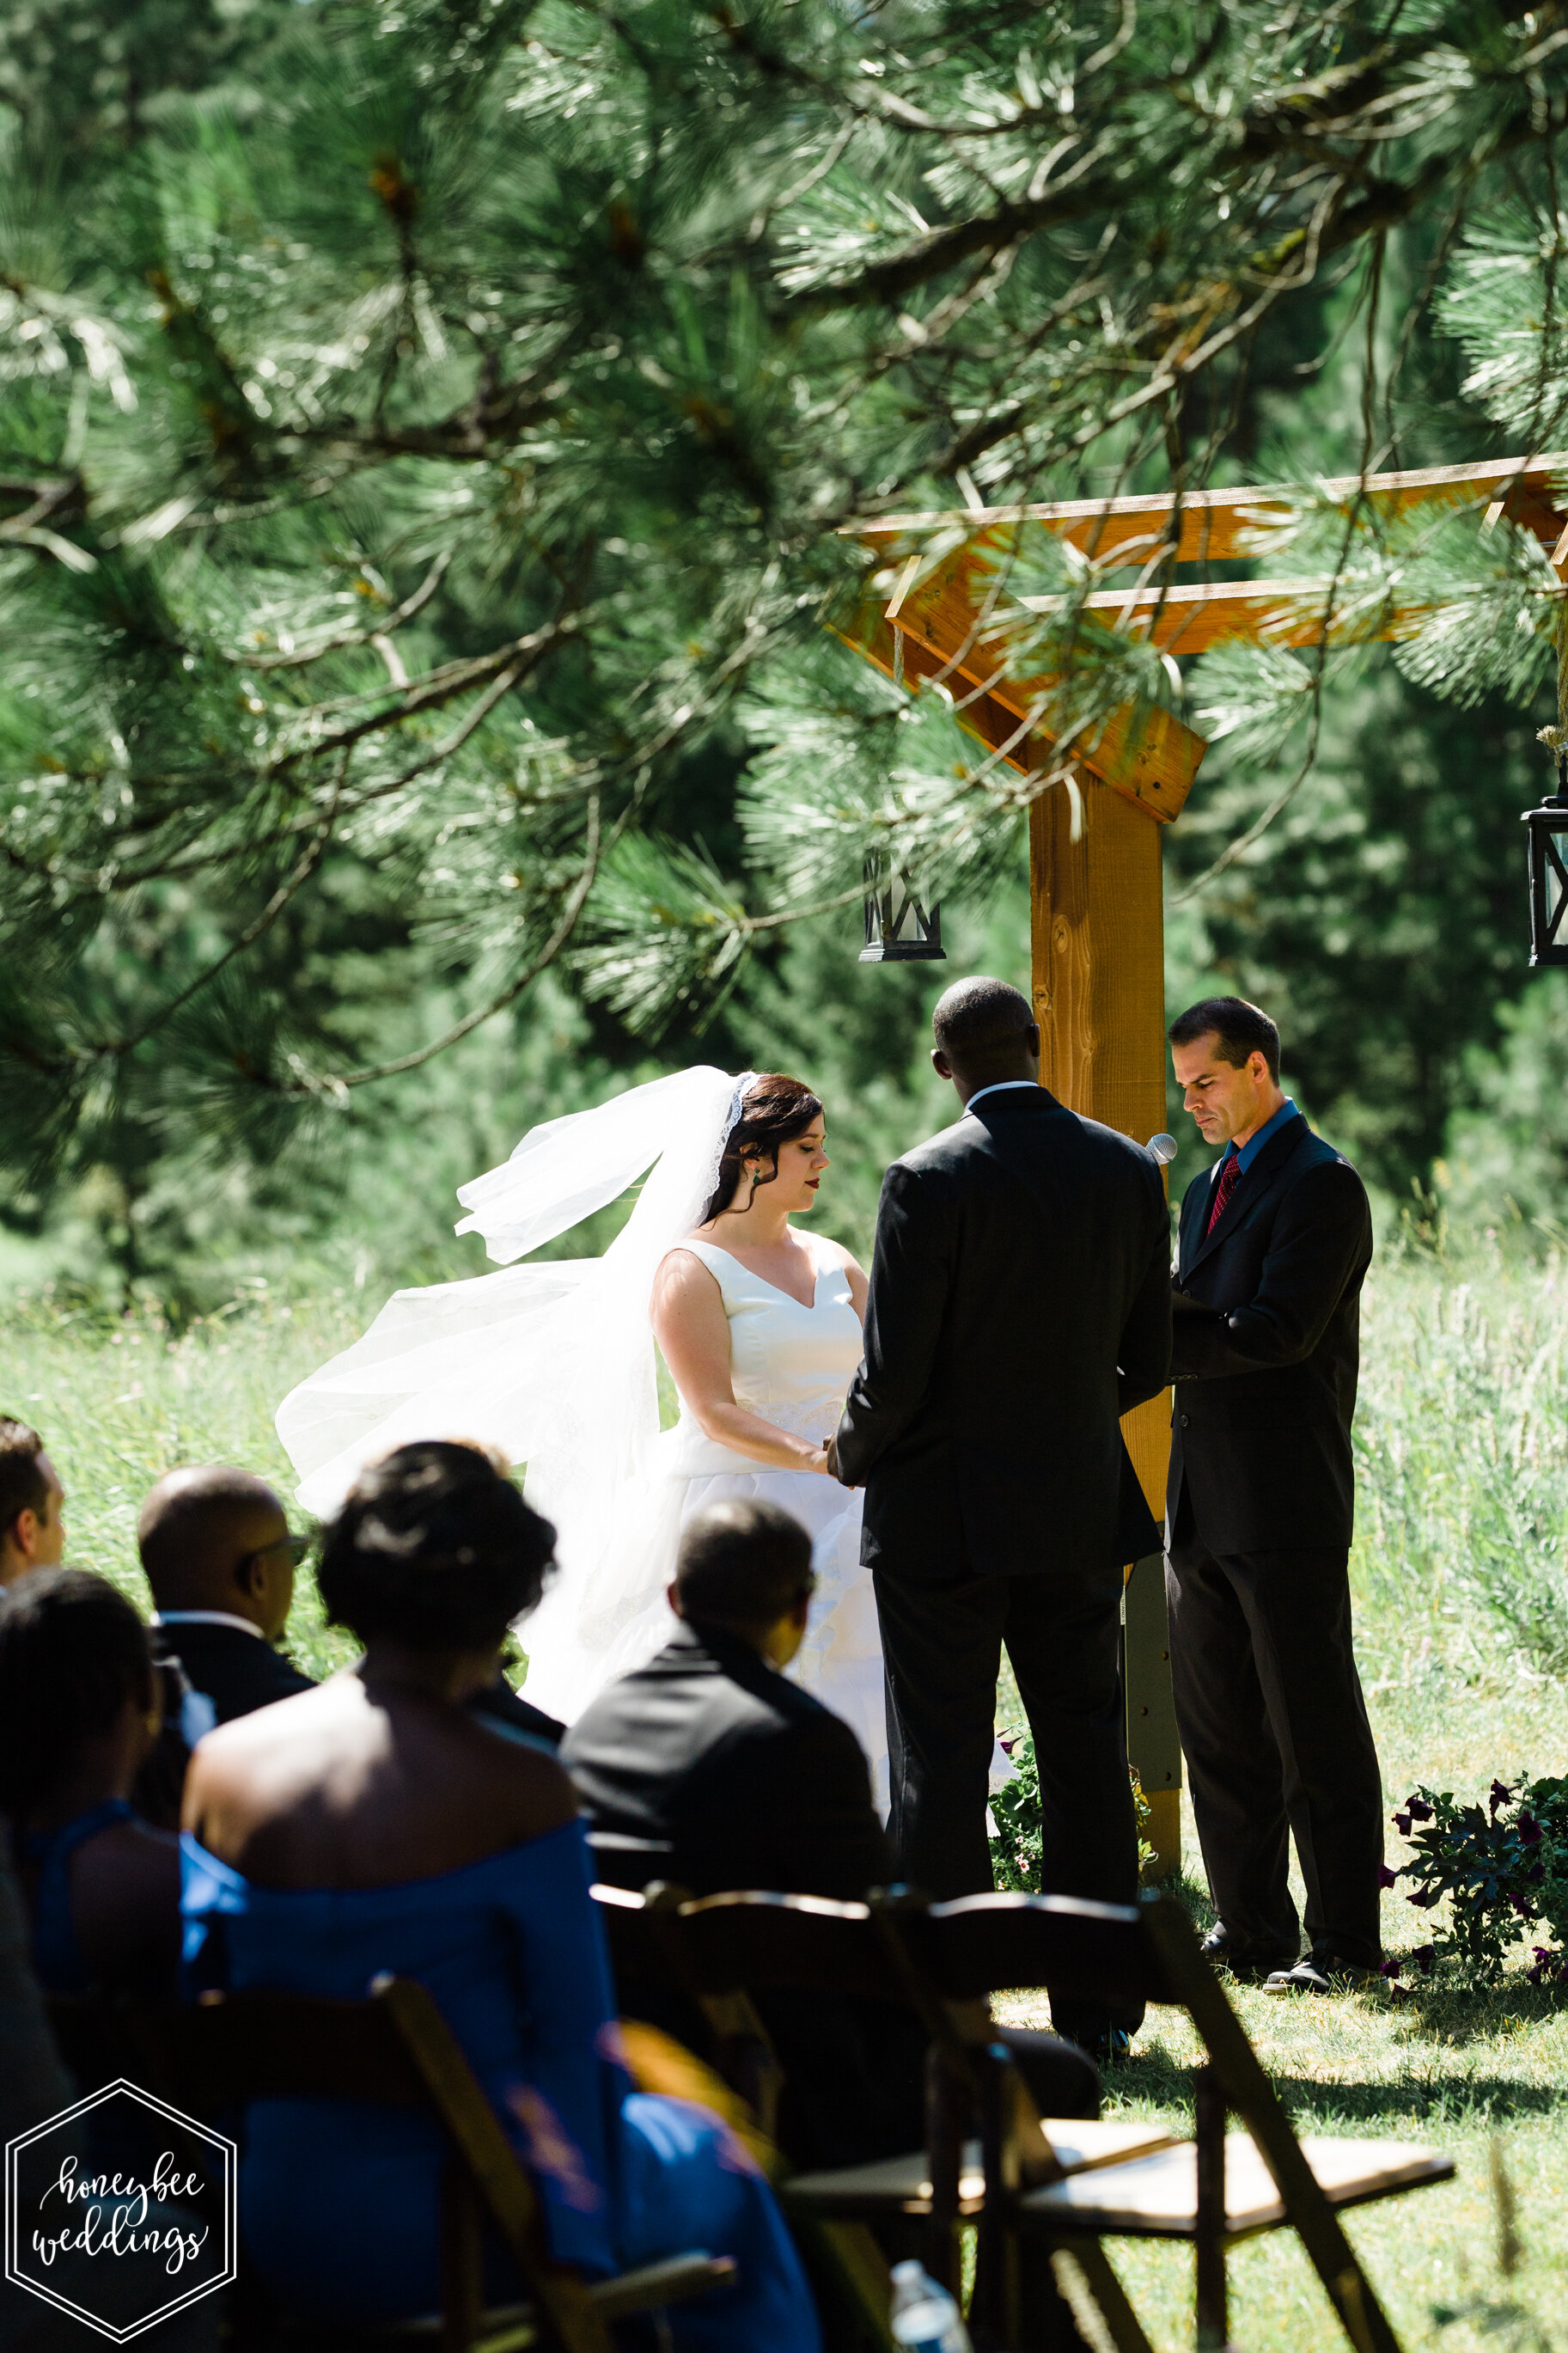 052White Raven Wedding_Montana Wedding Photographer_Rebekah & Likom_Honeybee Weddings_July 27, 2019-2034.jpg